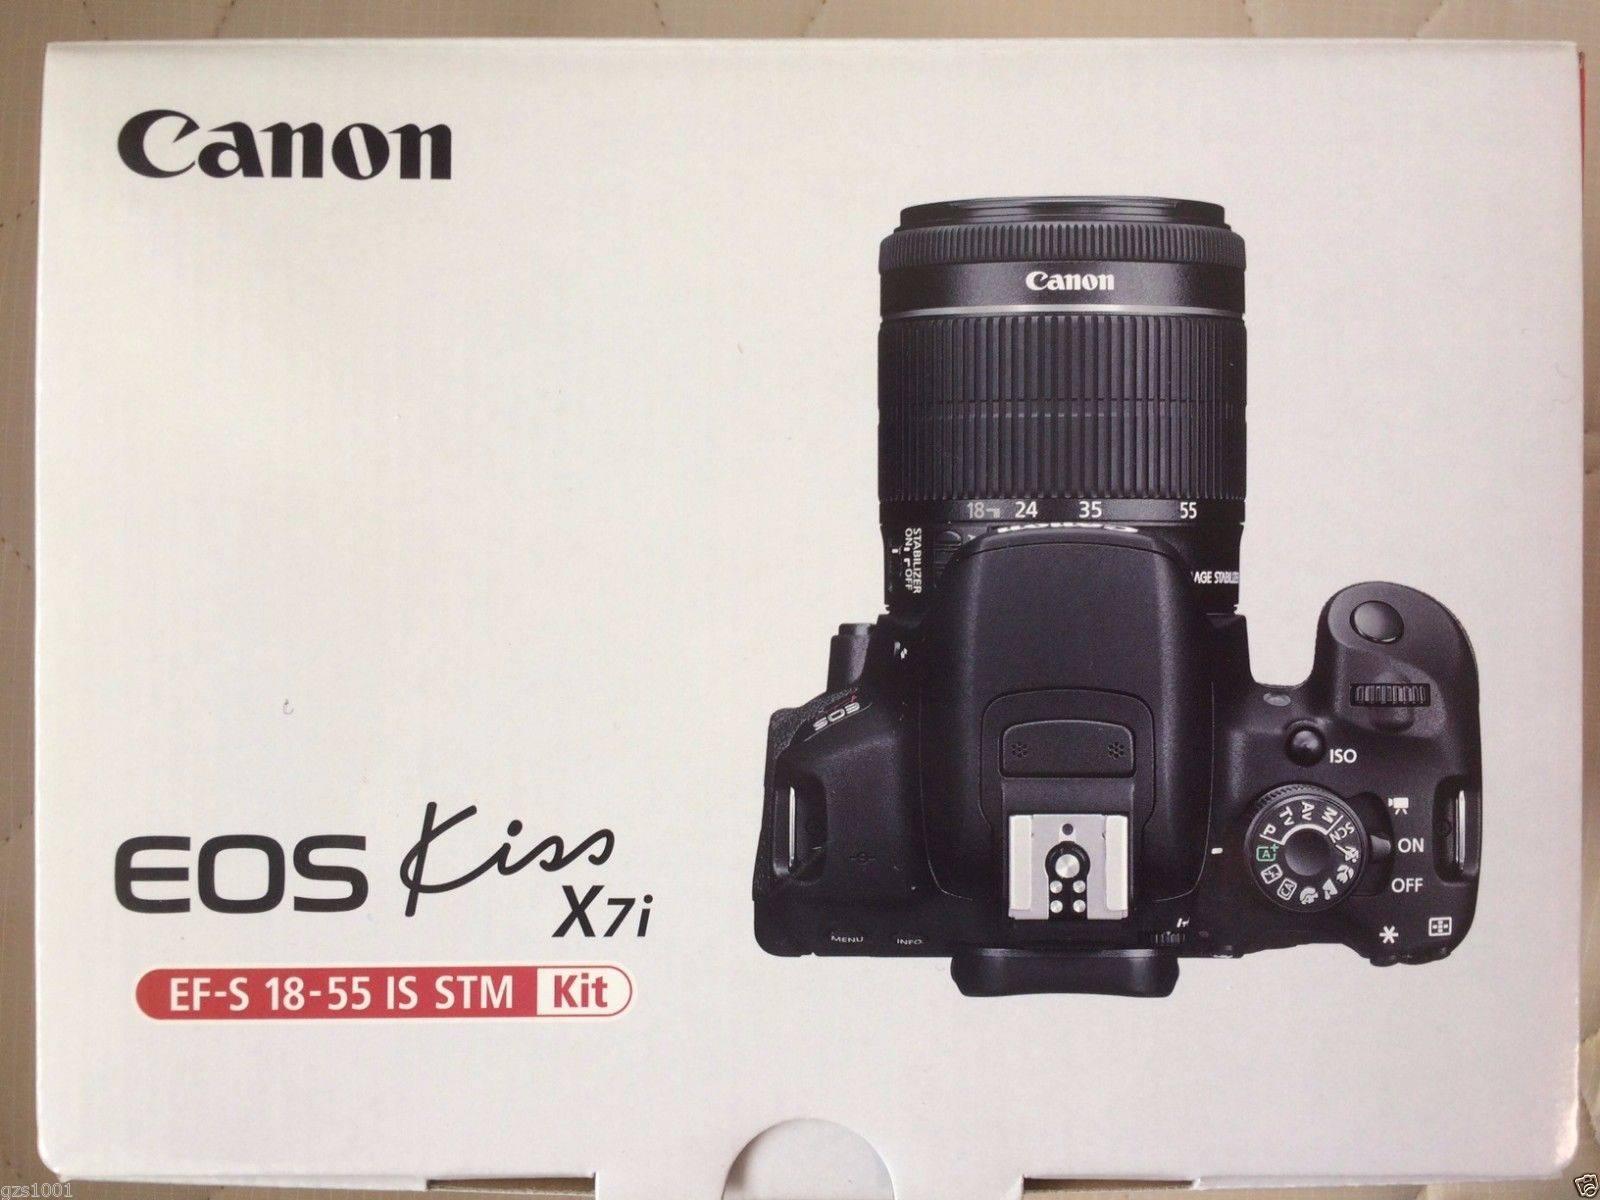 Canon EOS Kiss x7i Rebel